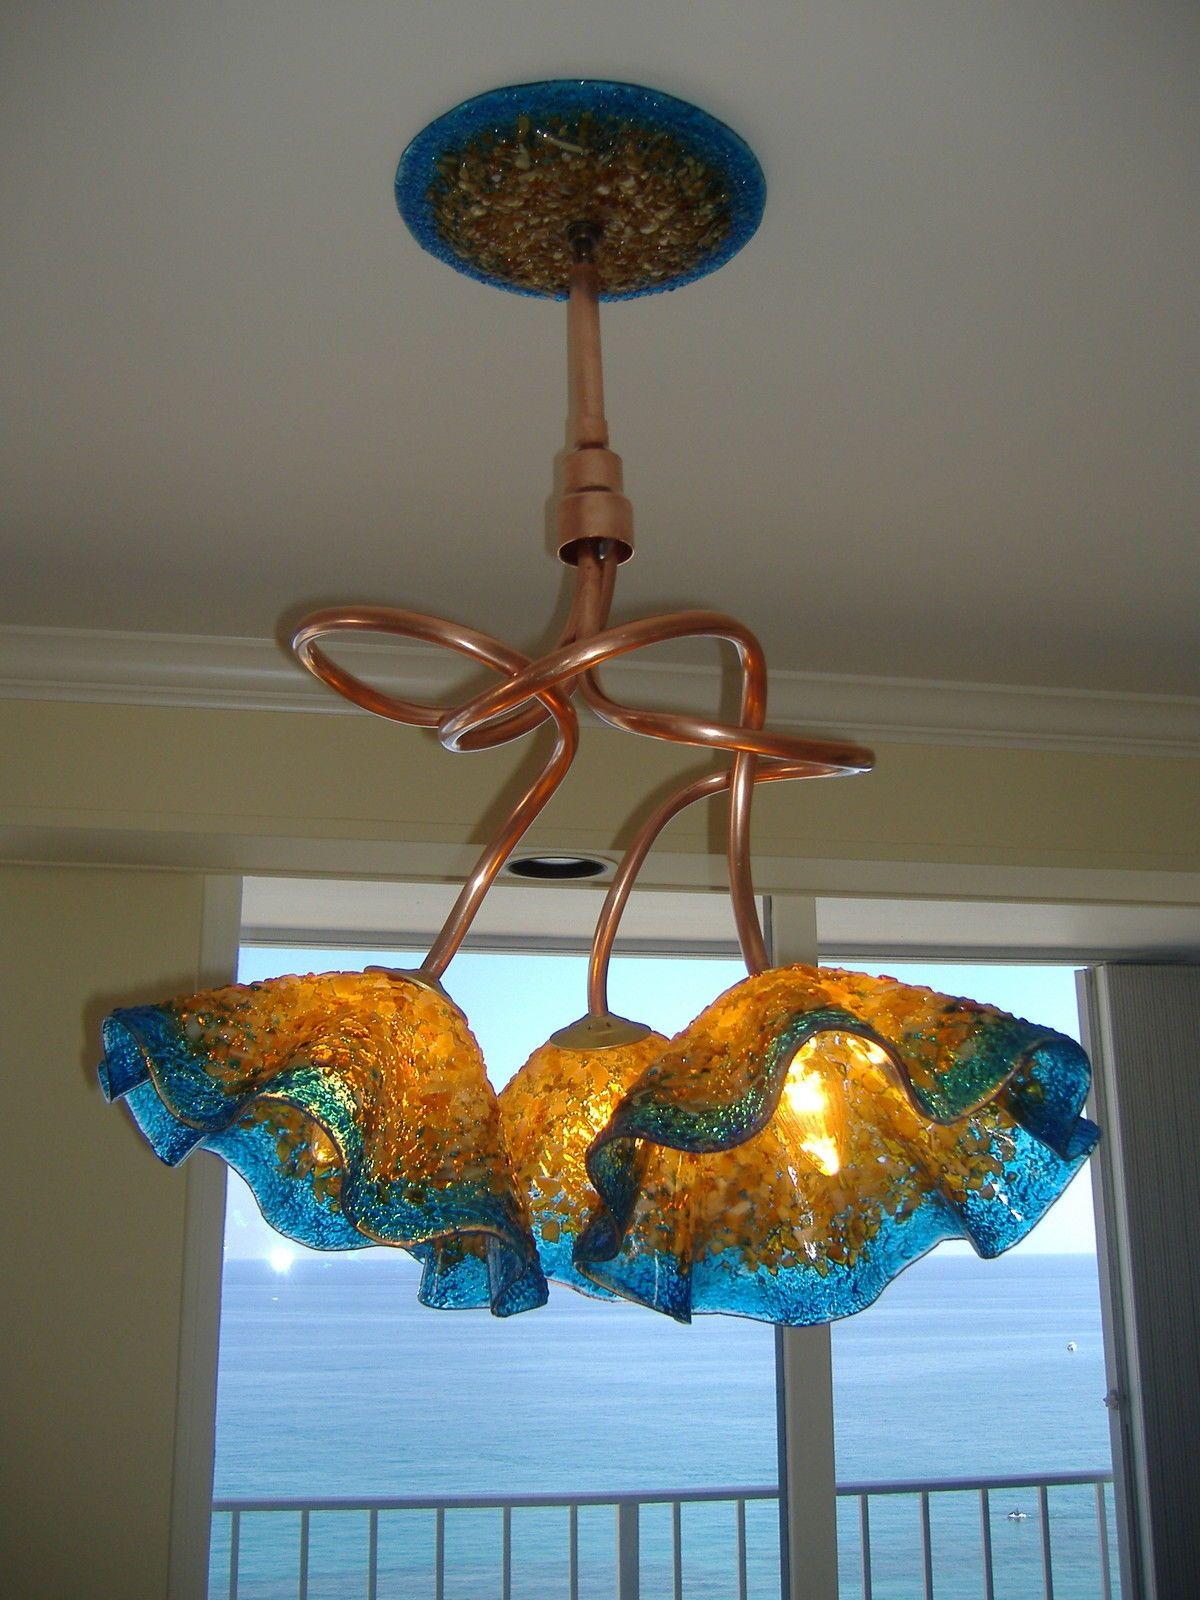 Blown Glass Chandelier Custom Chandelier Hand Blown Glass Amber Blue | eBay